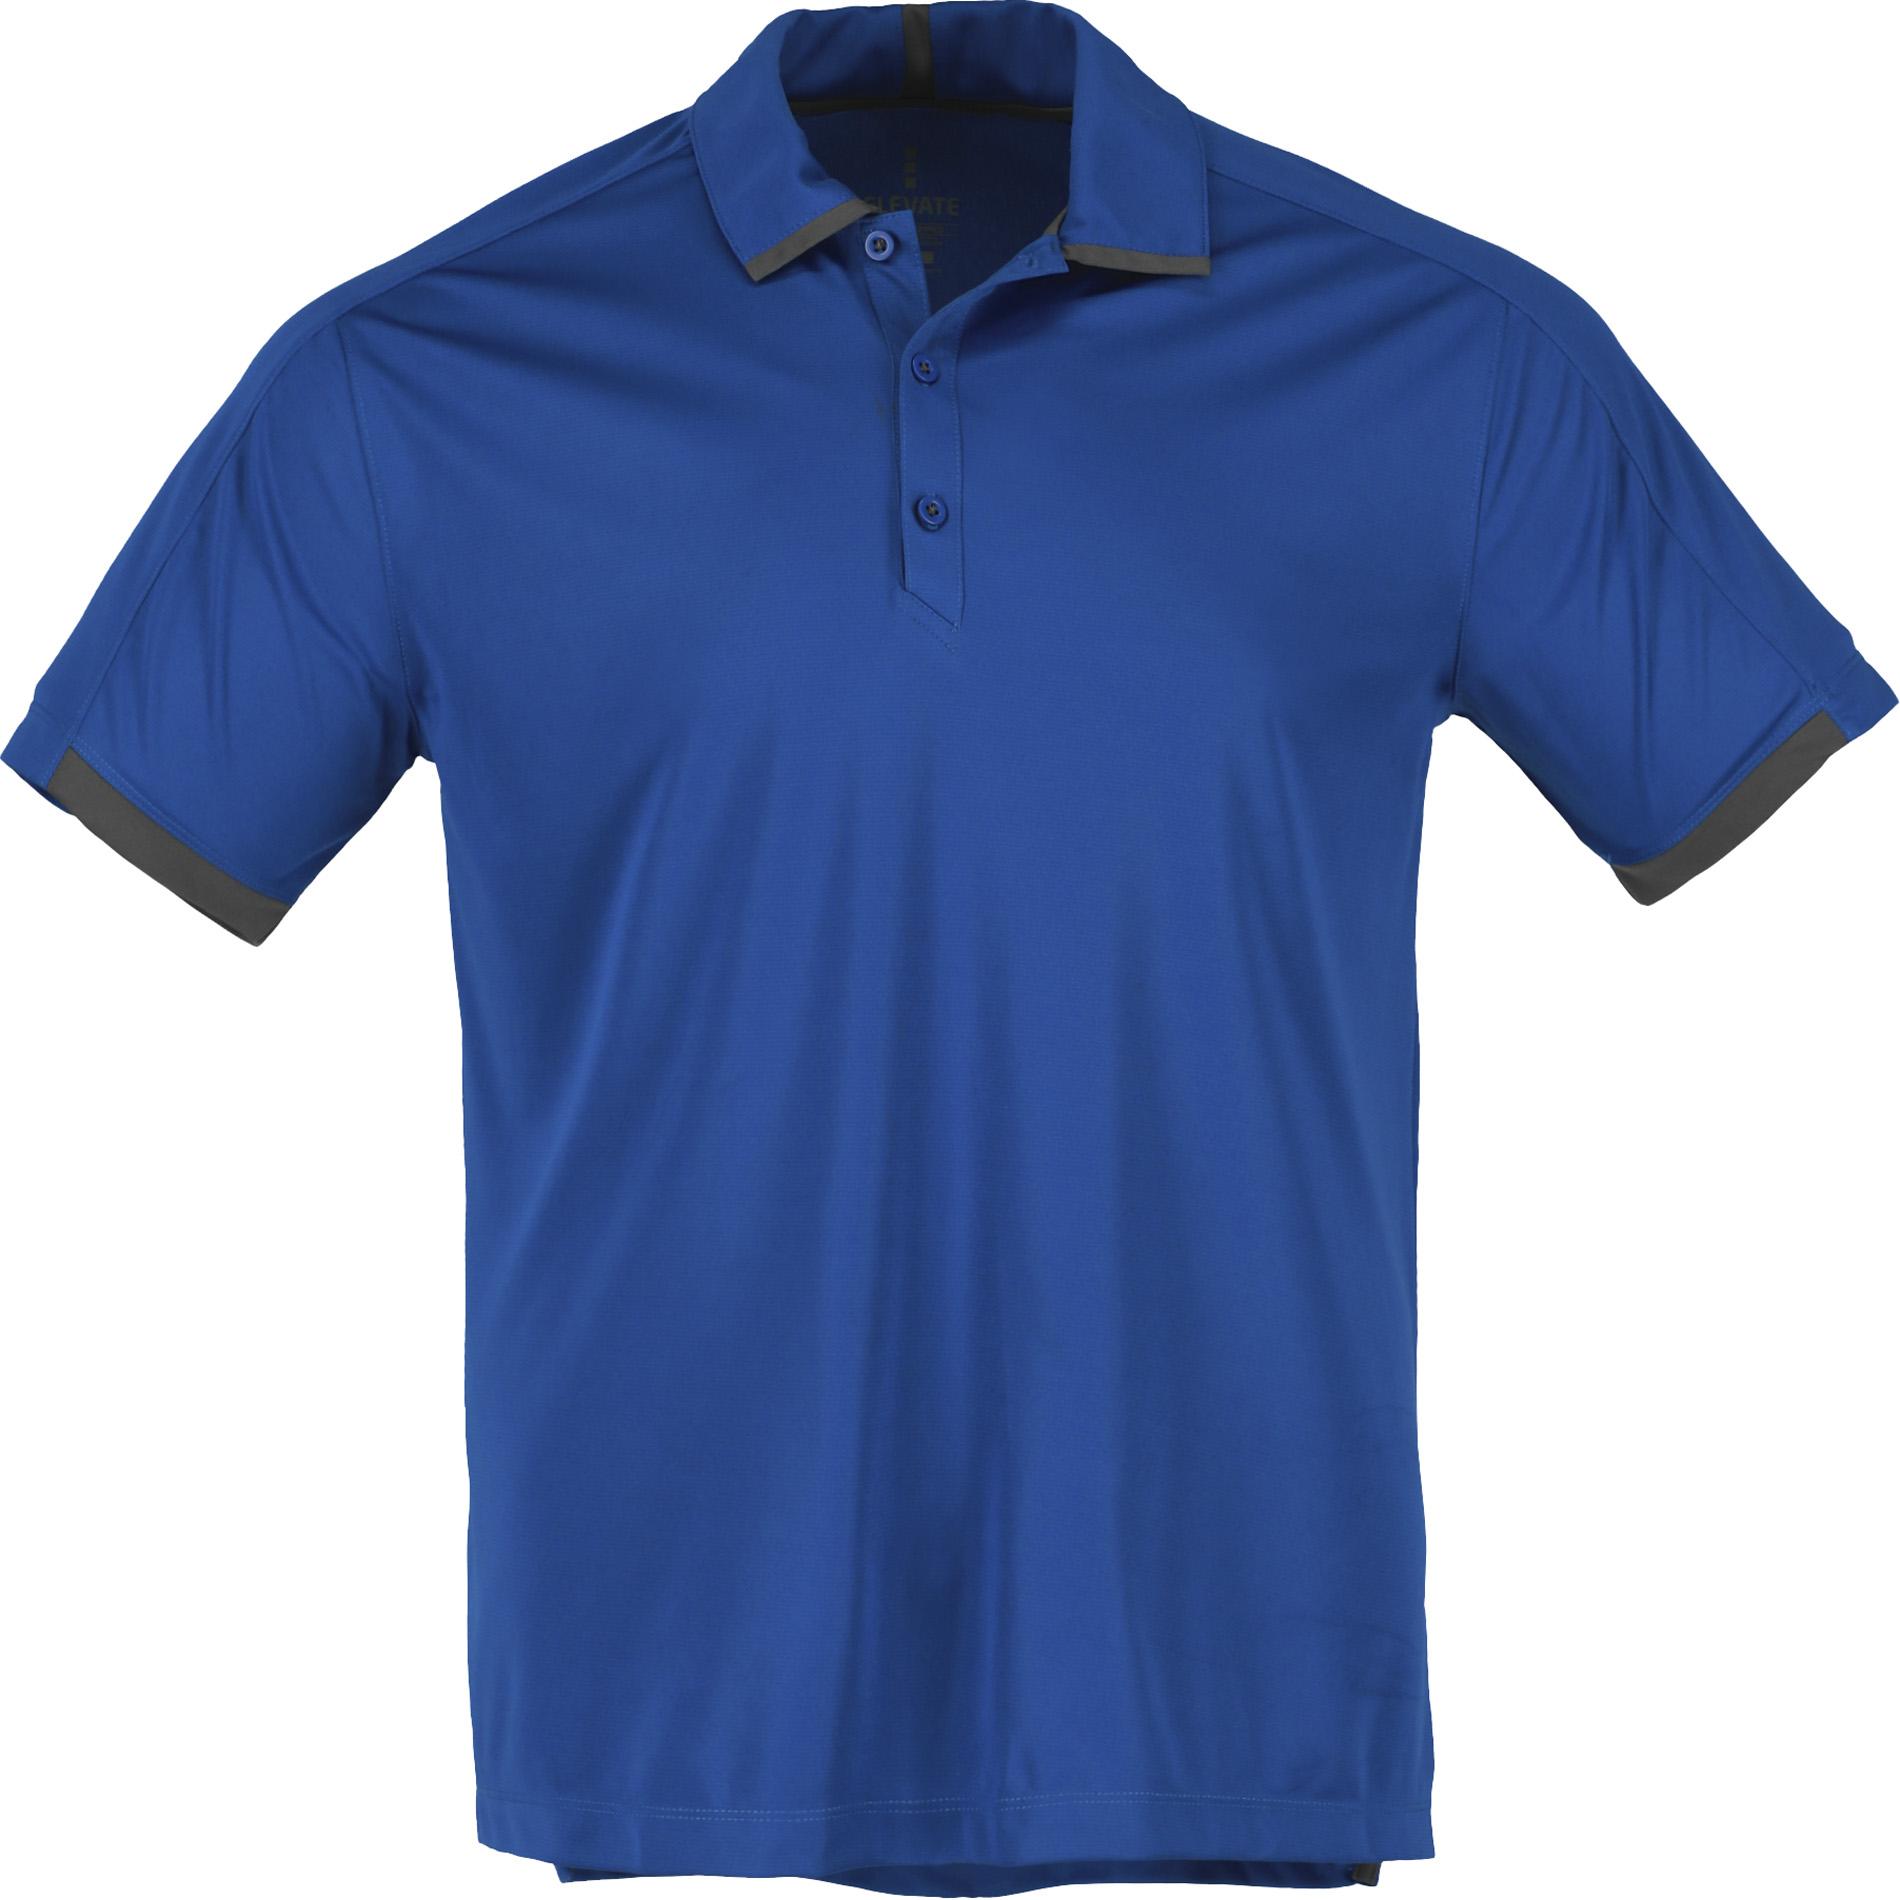 Elevate TM16512 - Men's CERRADO Short Sleeve Polo